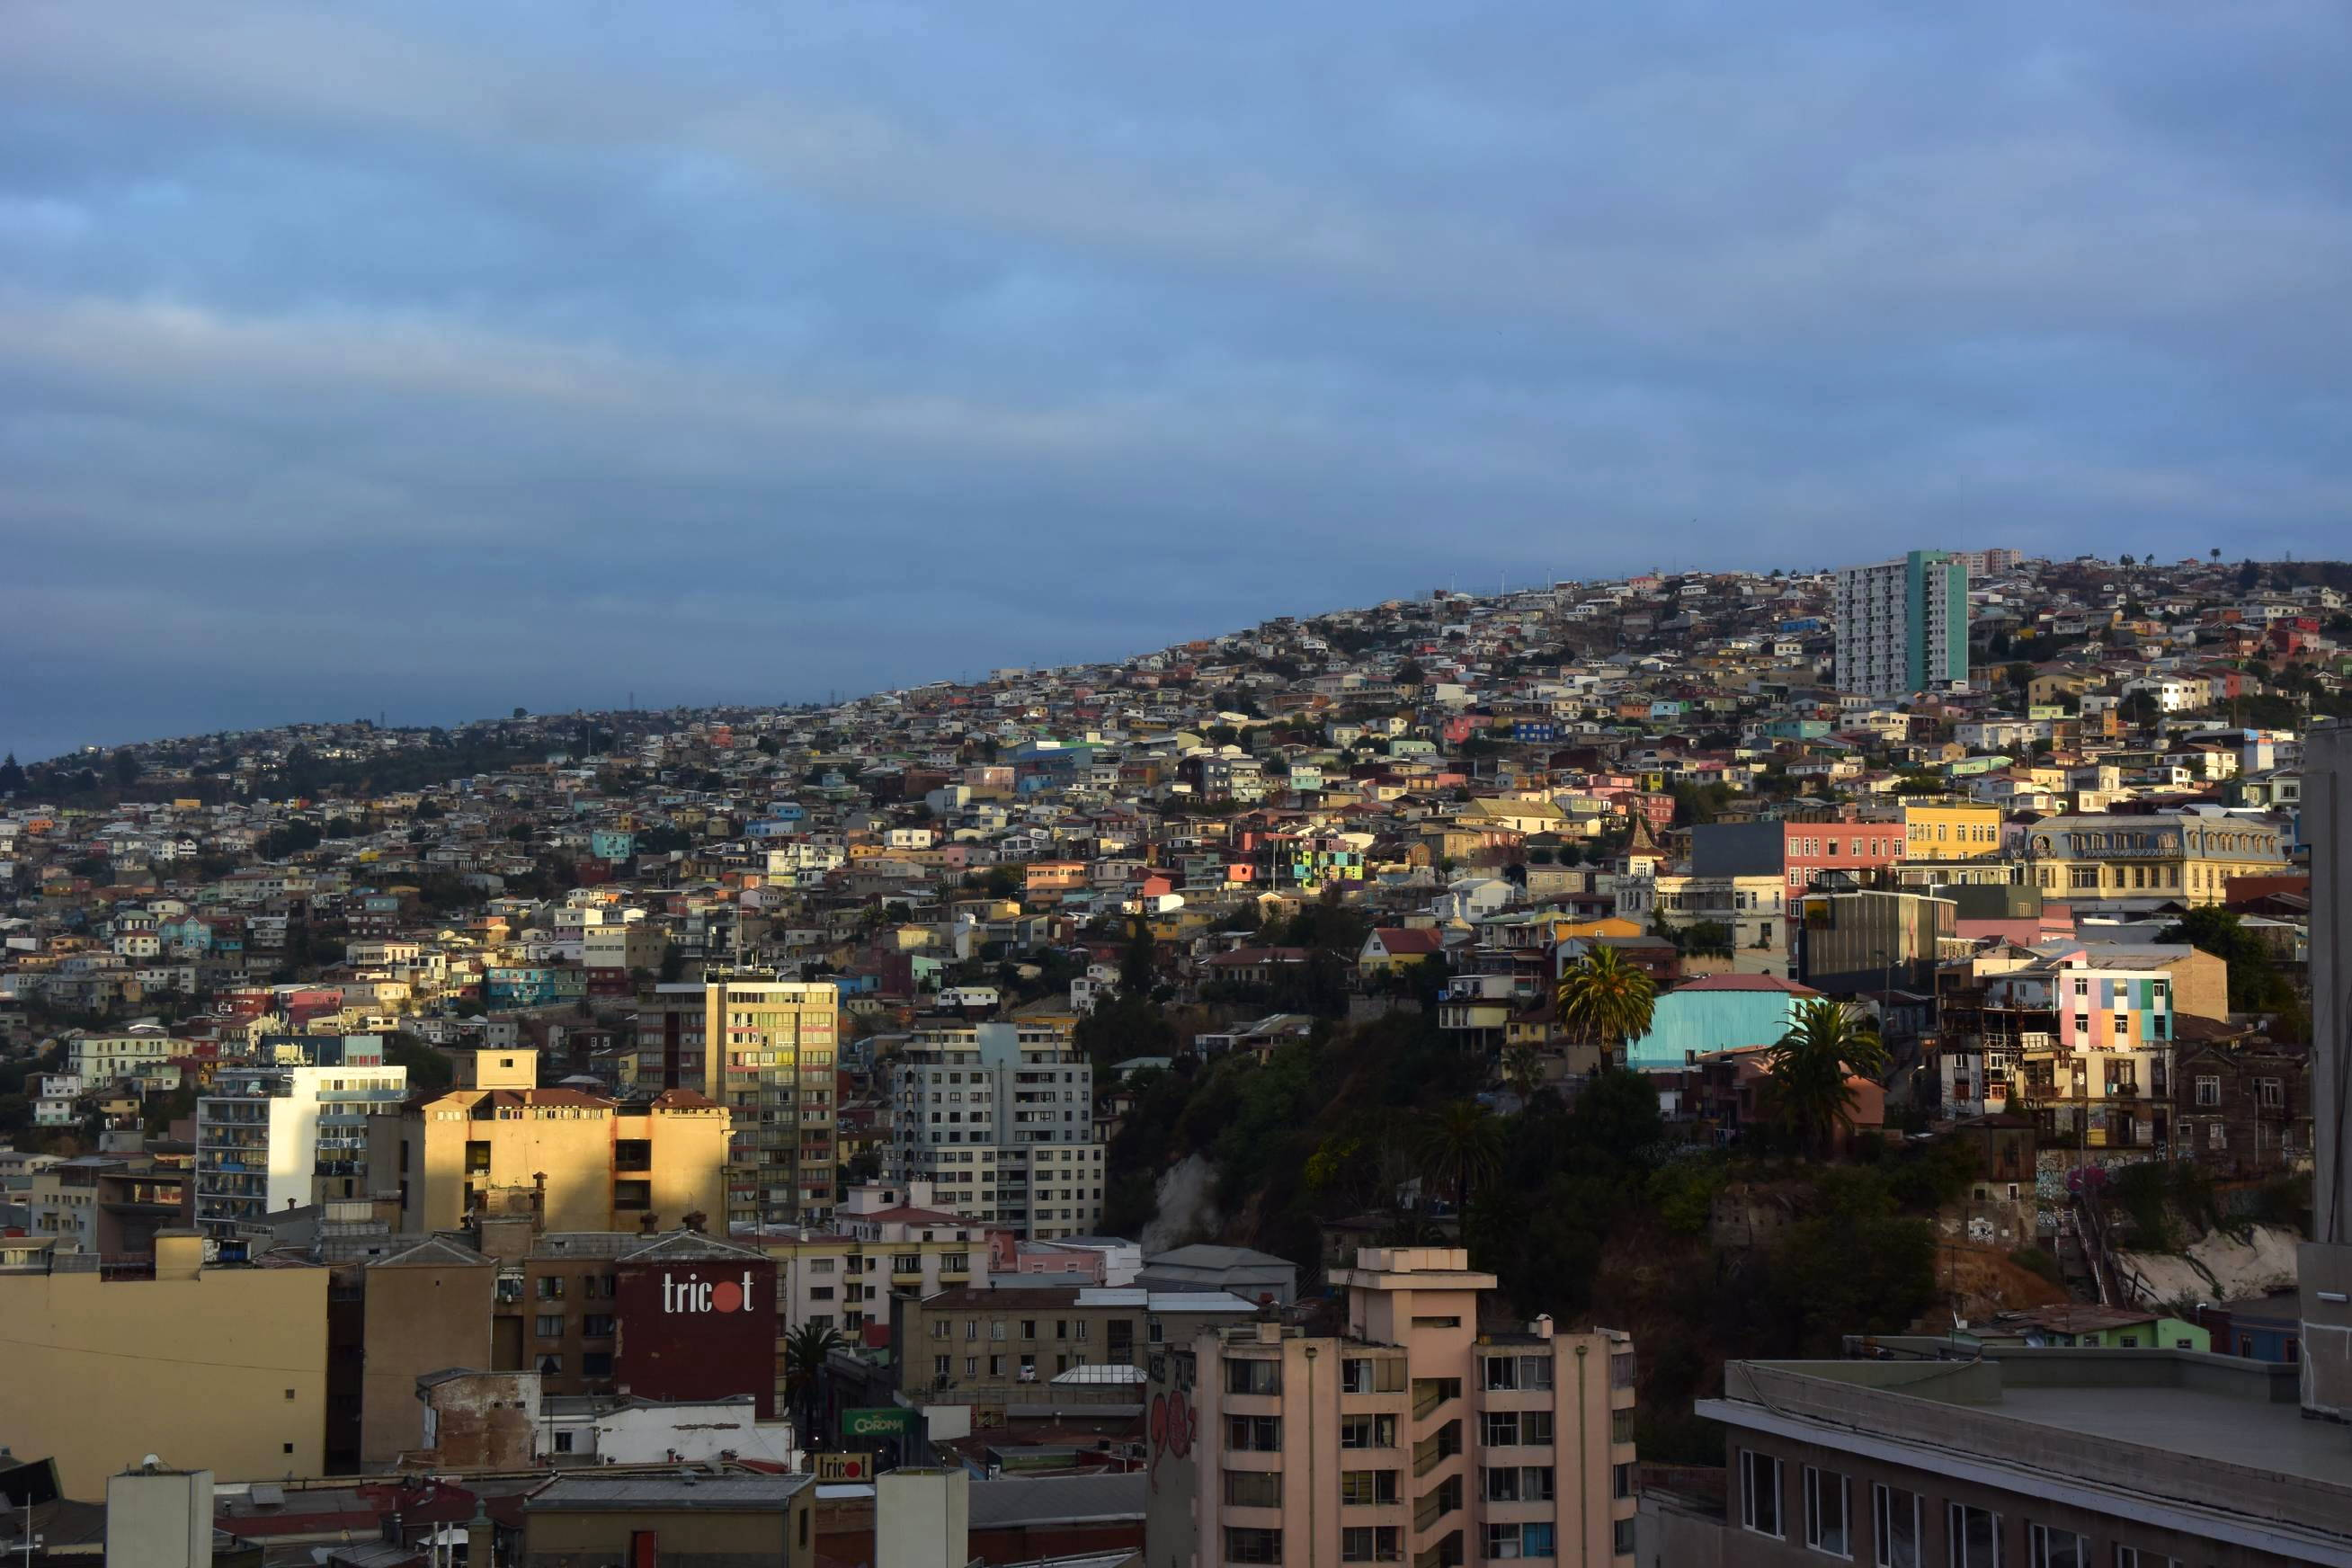 Collines de Valparaiso 1